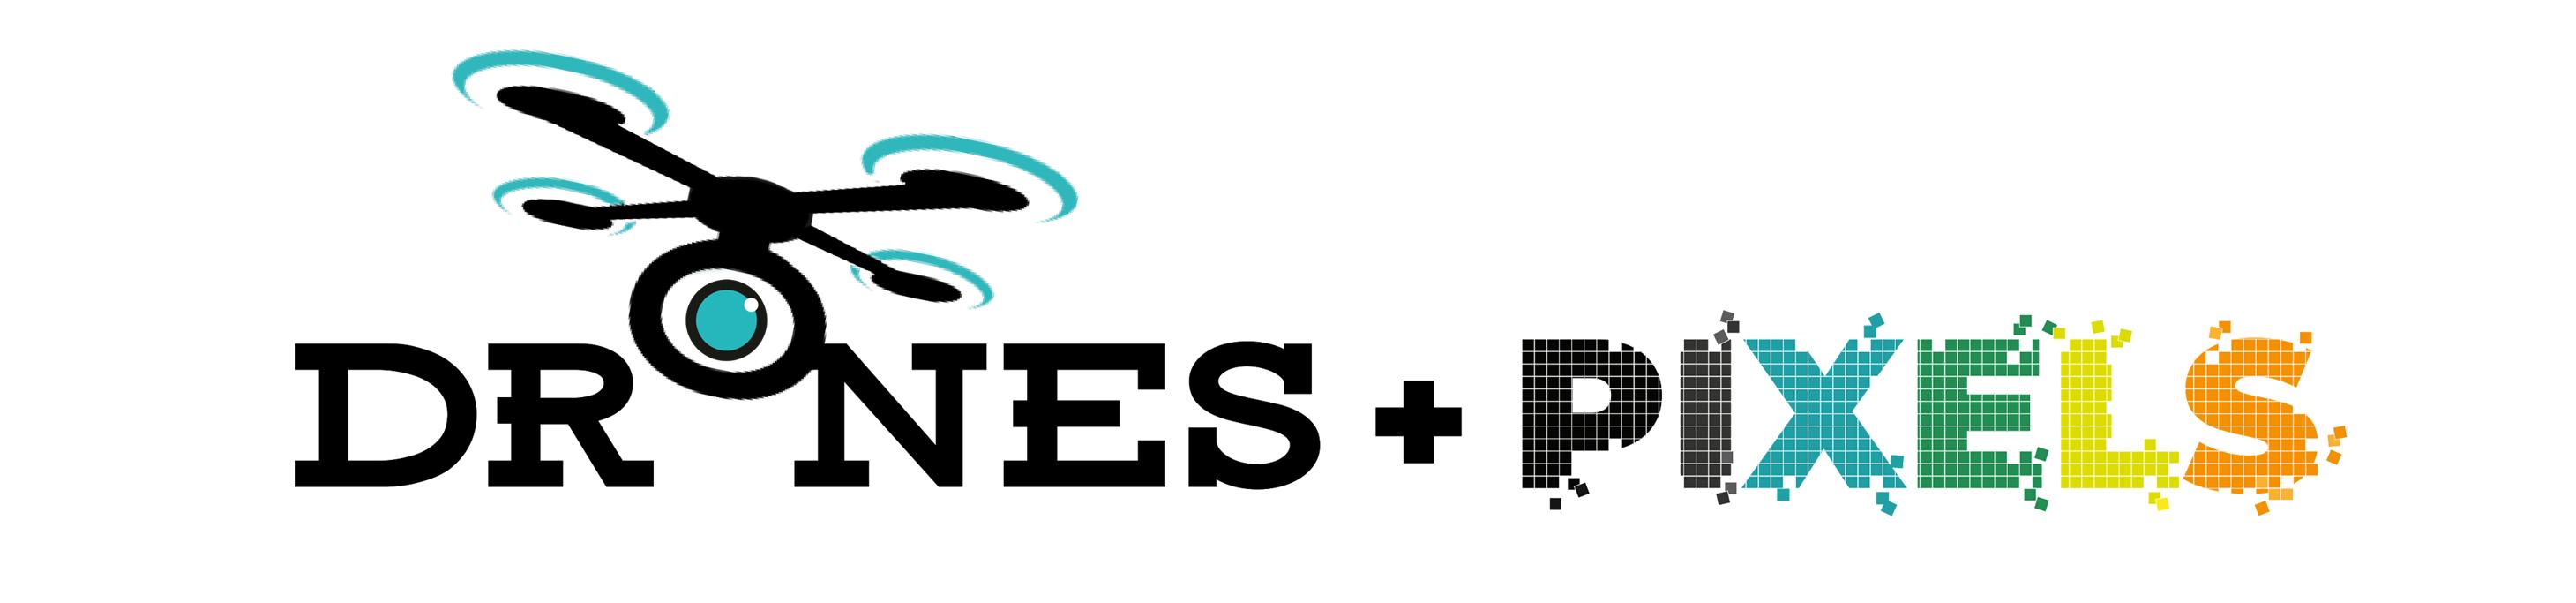 Drones and Pixels